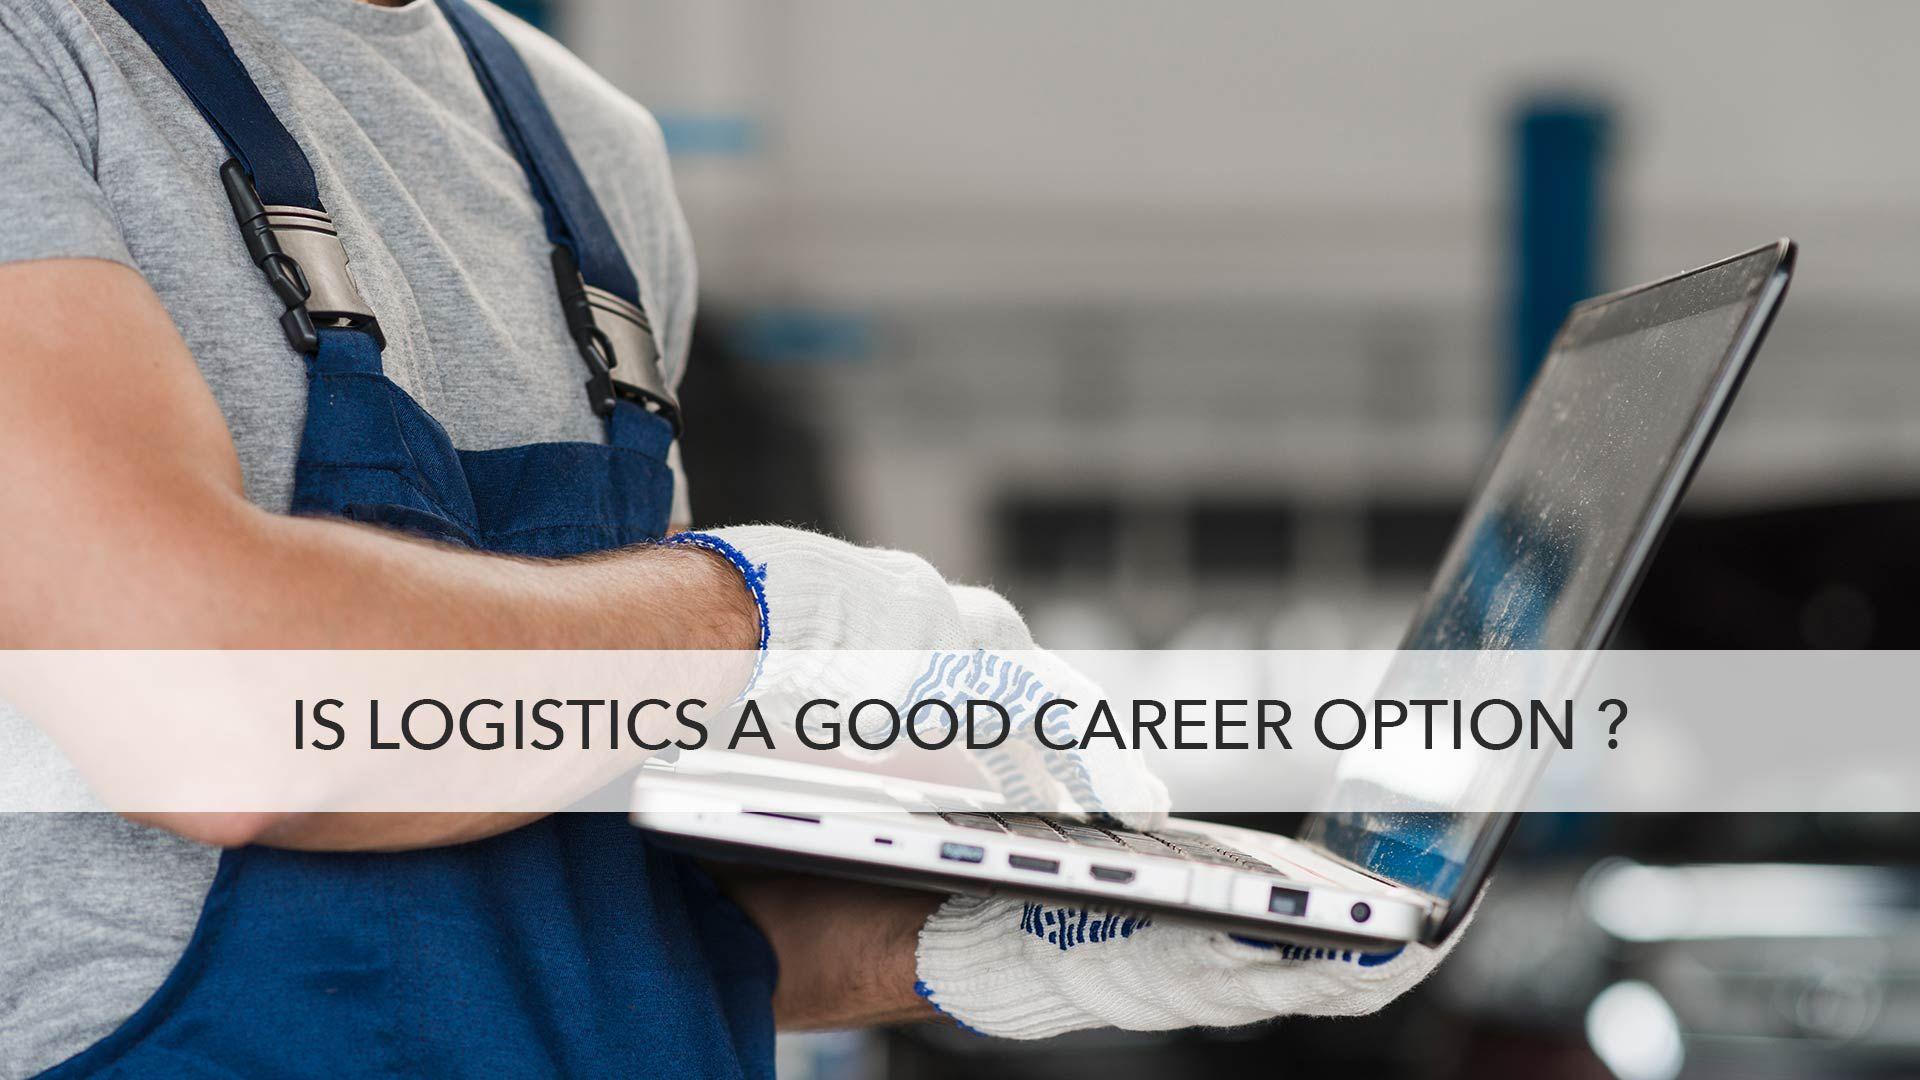 Pin by Logistics & Aviation Management on Logistics